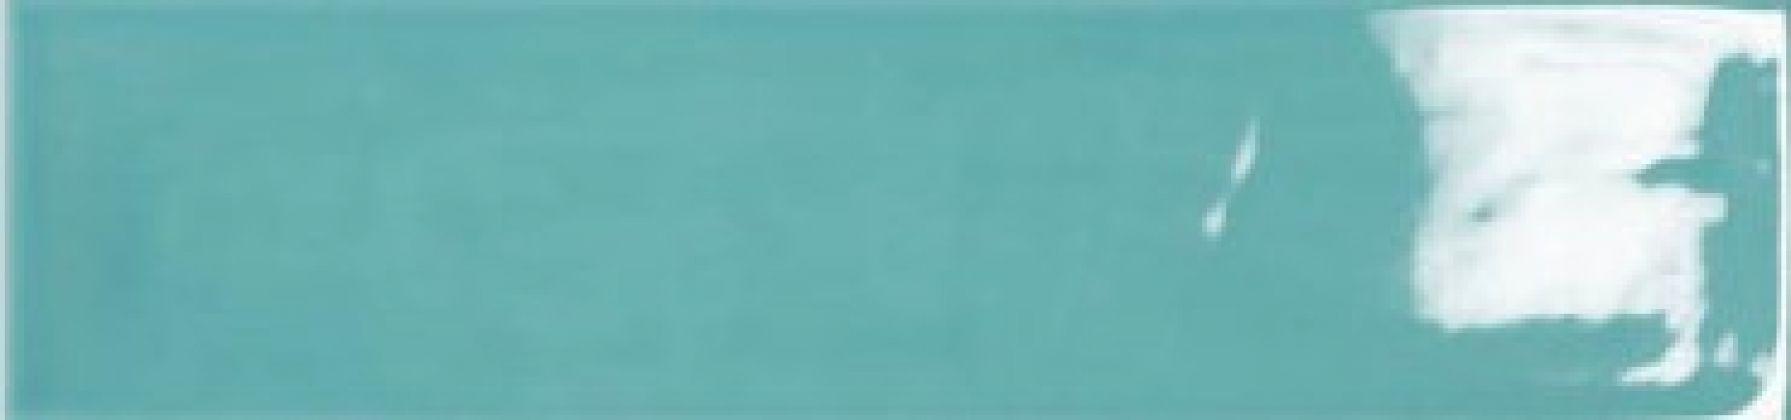 MAIOLICA GLOSS AQUAMARINE 7,5x30